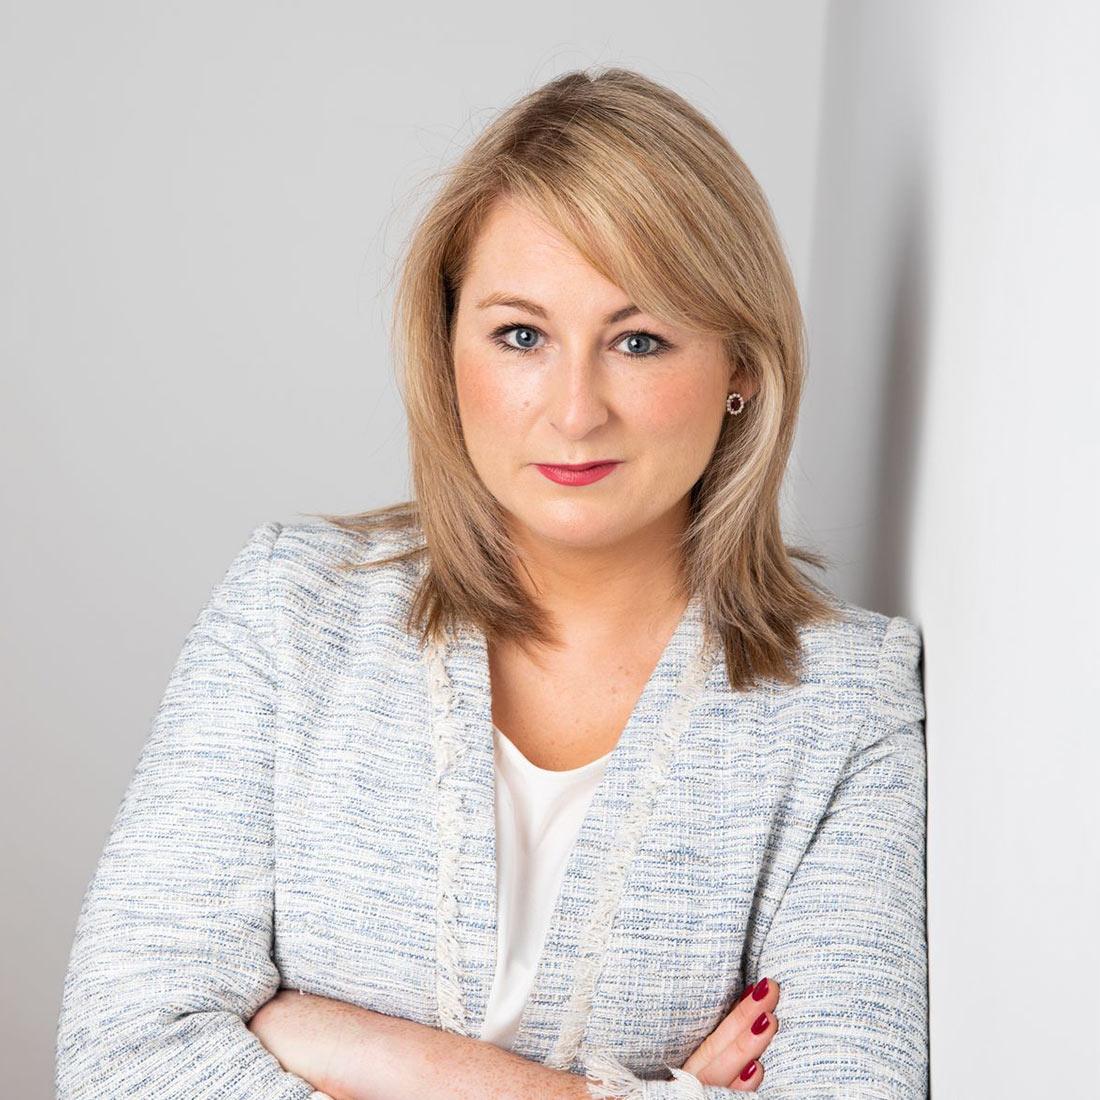 Paula Cullinane